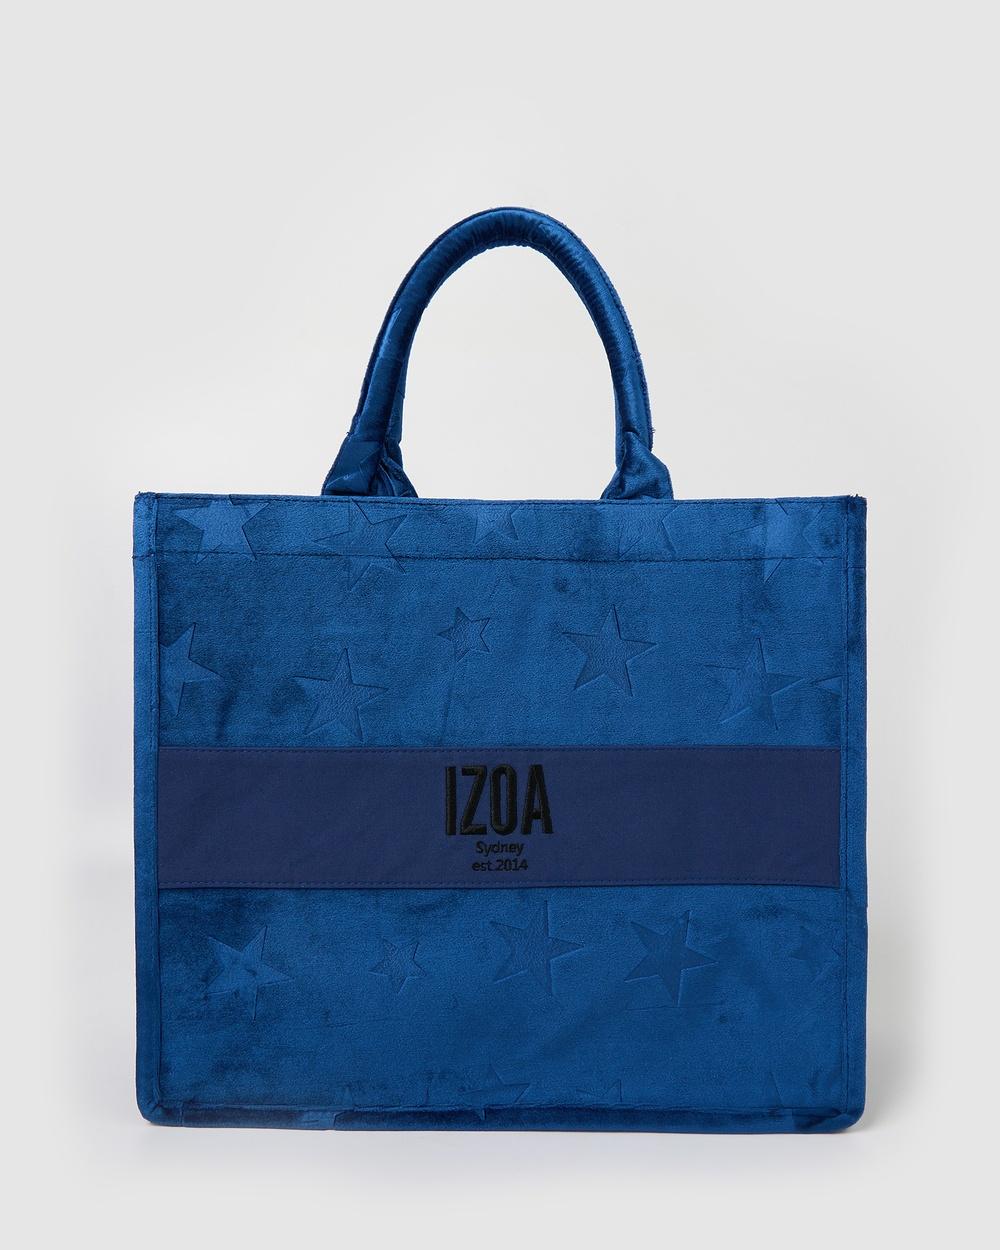 Izoa Miranda Tote Bag Beach Bags Blue